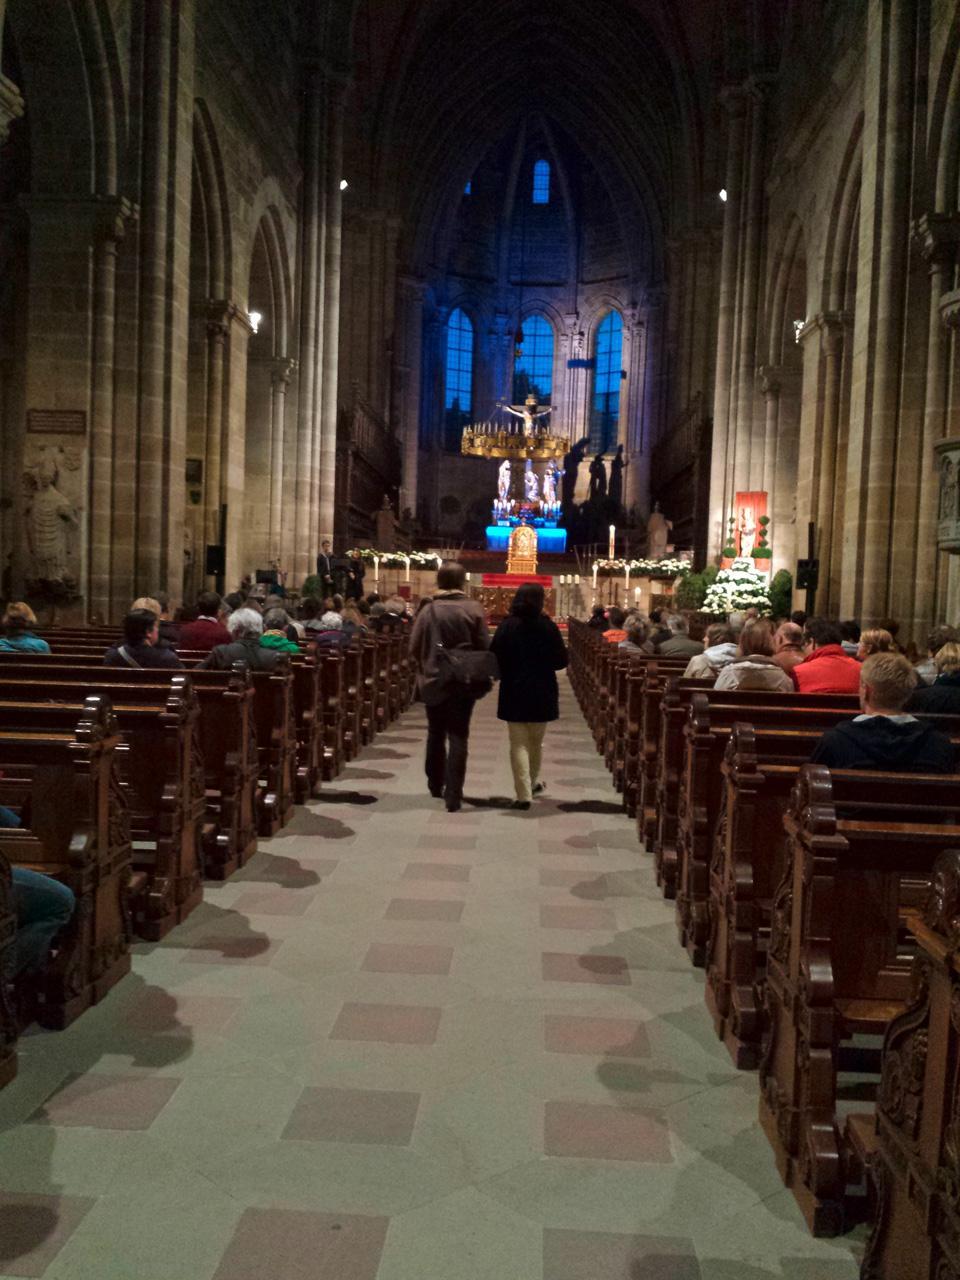 Kultur in der Kirche